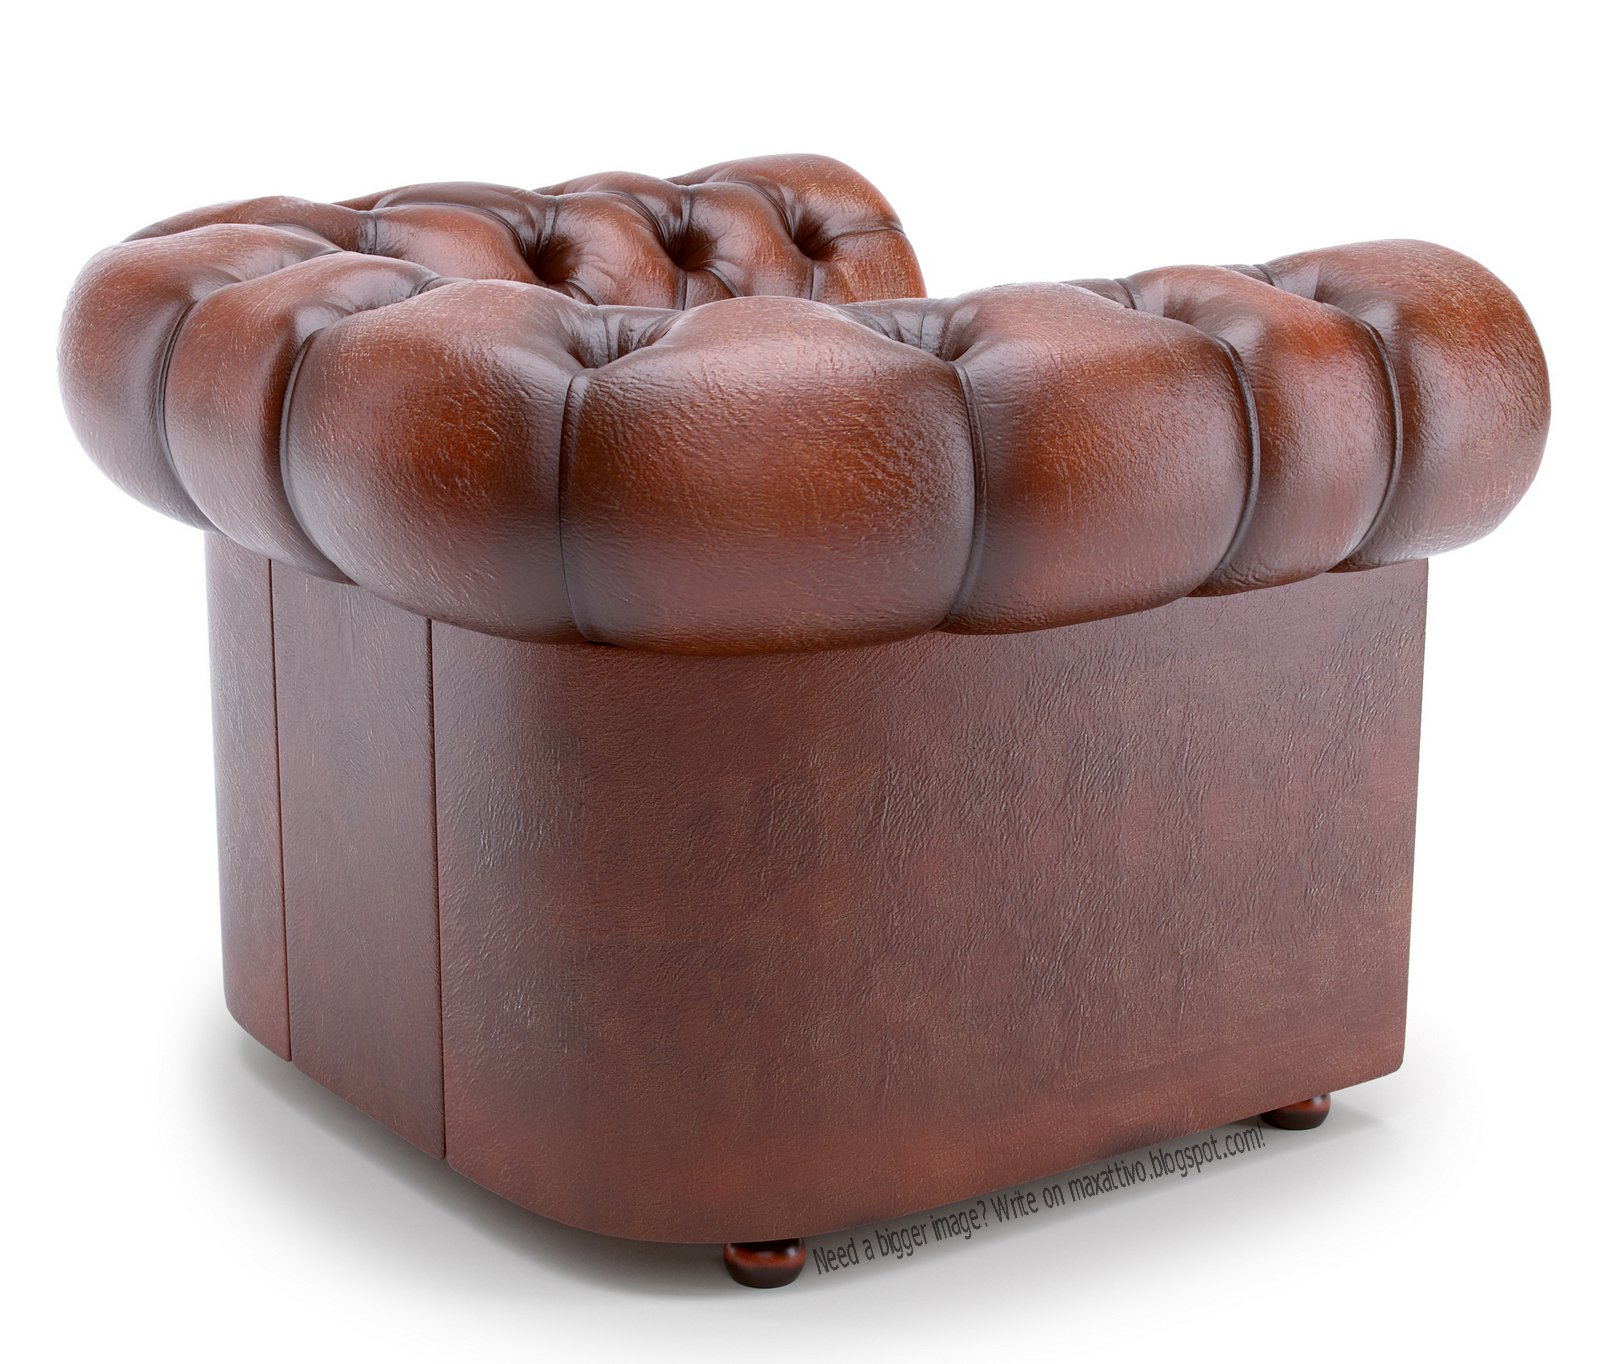 http://4.bp.blogspot.com/-5SNZkQo6Ybg/TinnYxulUaI/AAAAAAAABXg/SlpVHStNtFM/s1600/chesterfield-armchair-3d-model-4.jpg